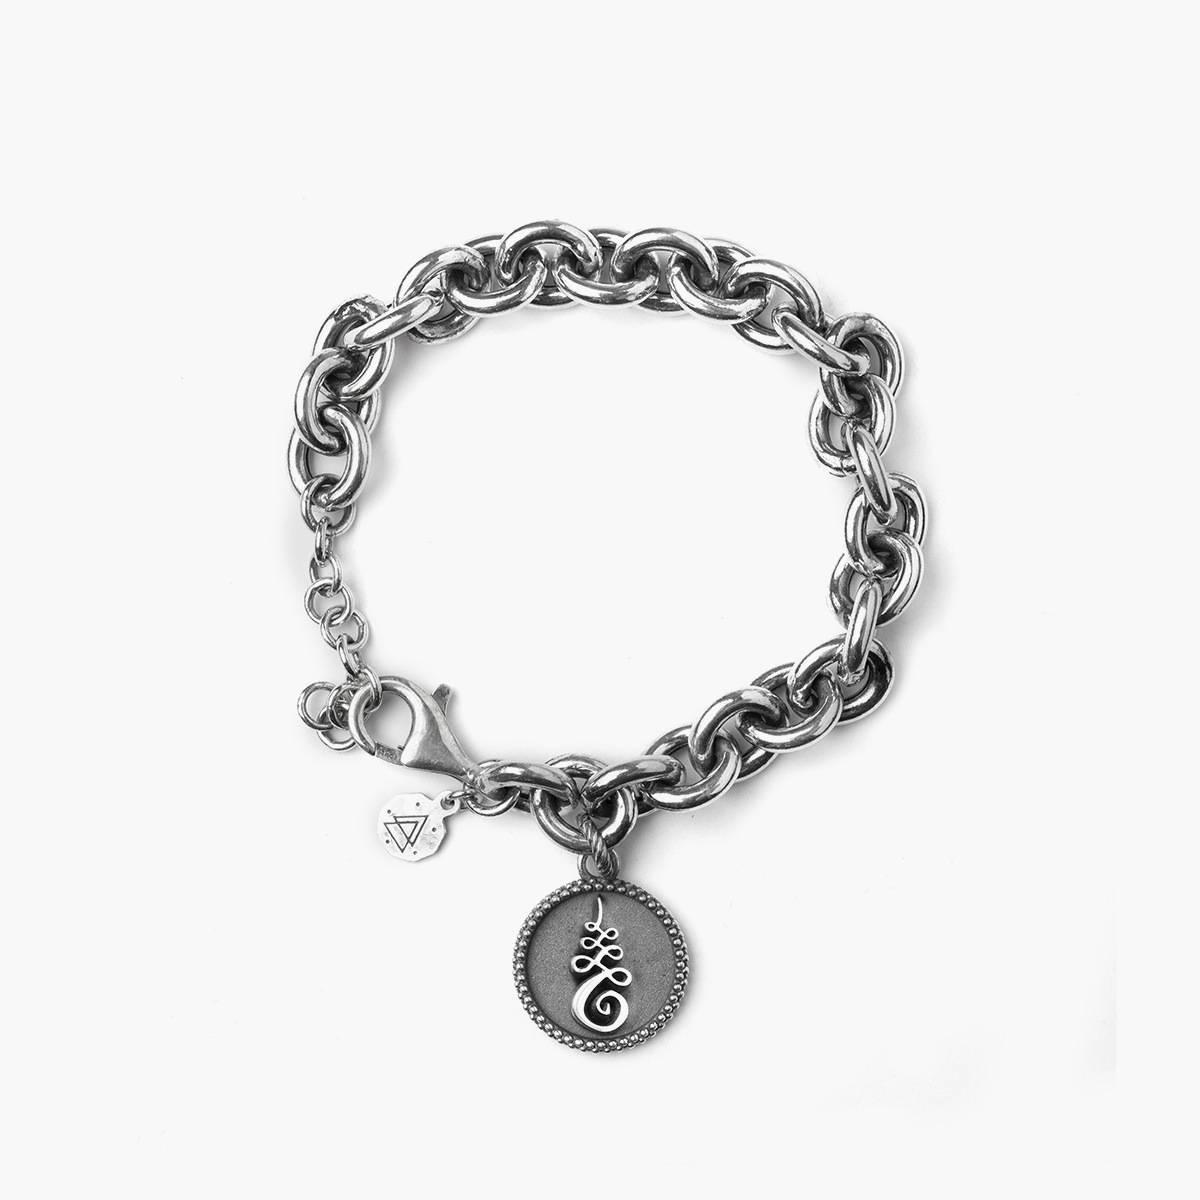 custom mens 925 sterling silver bracelet add own logo on the jewelry